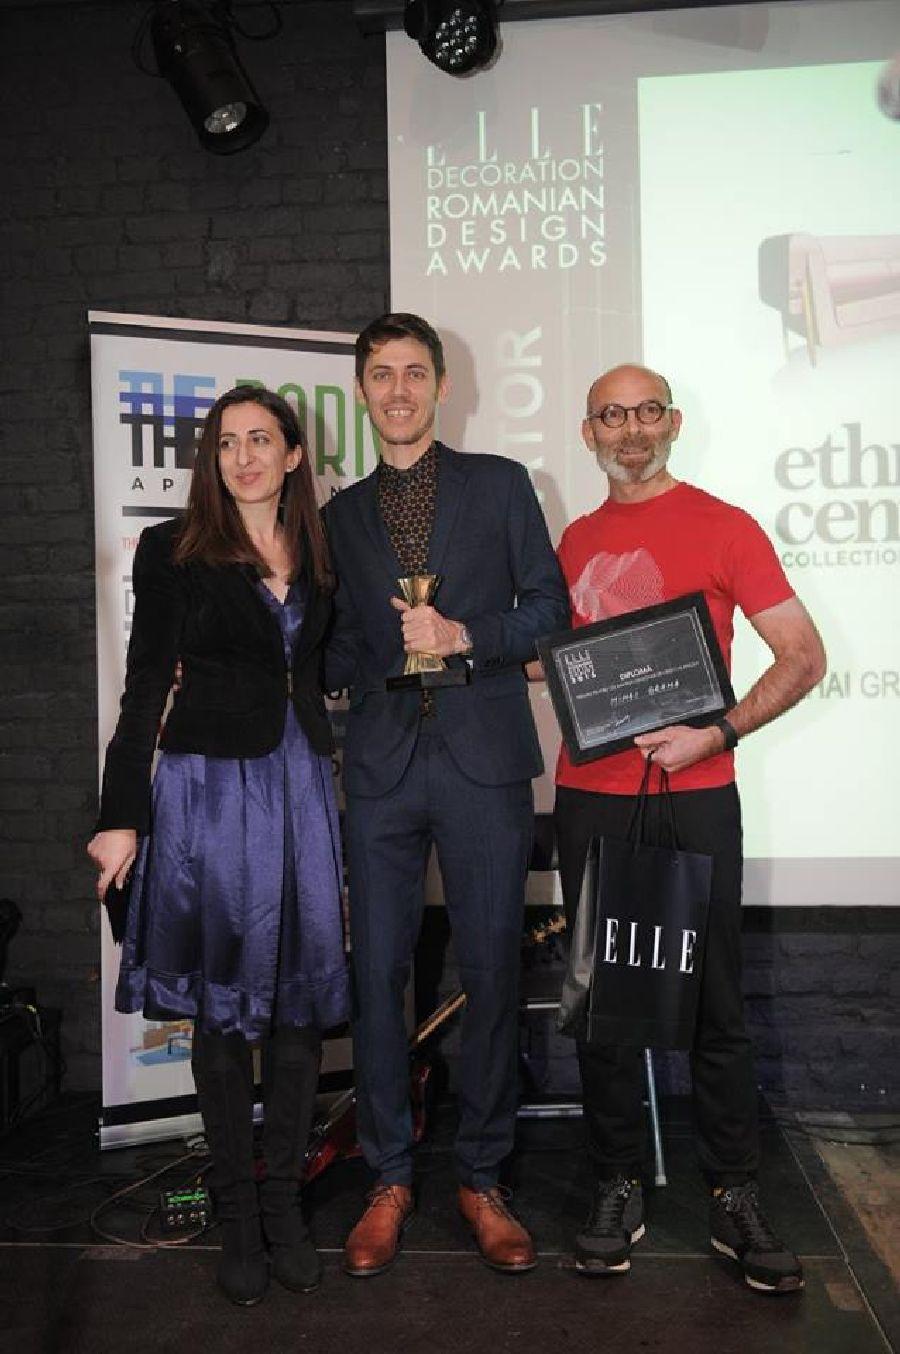 adelaparvu.com despre premiile Elle Decoration 2015, Ileana Raducanu redactor sef Elle Decoration, designerul Mihai Grama si designerul Catalin Nastasoiu